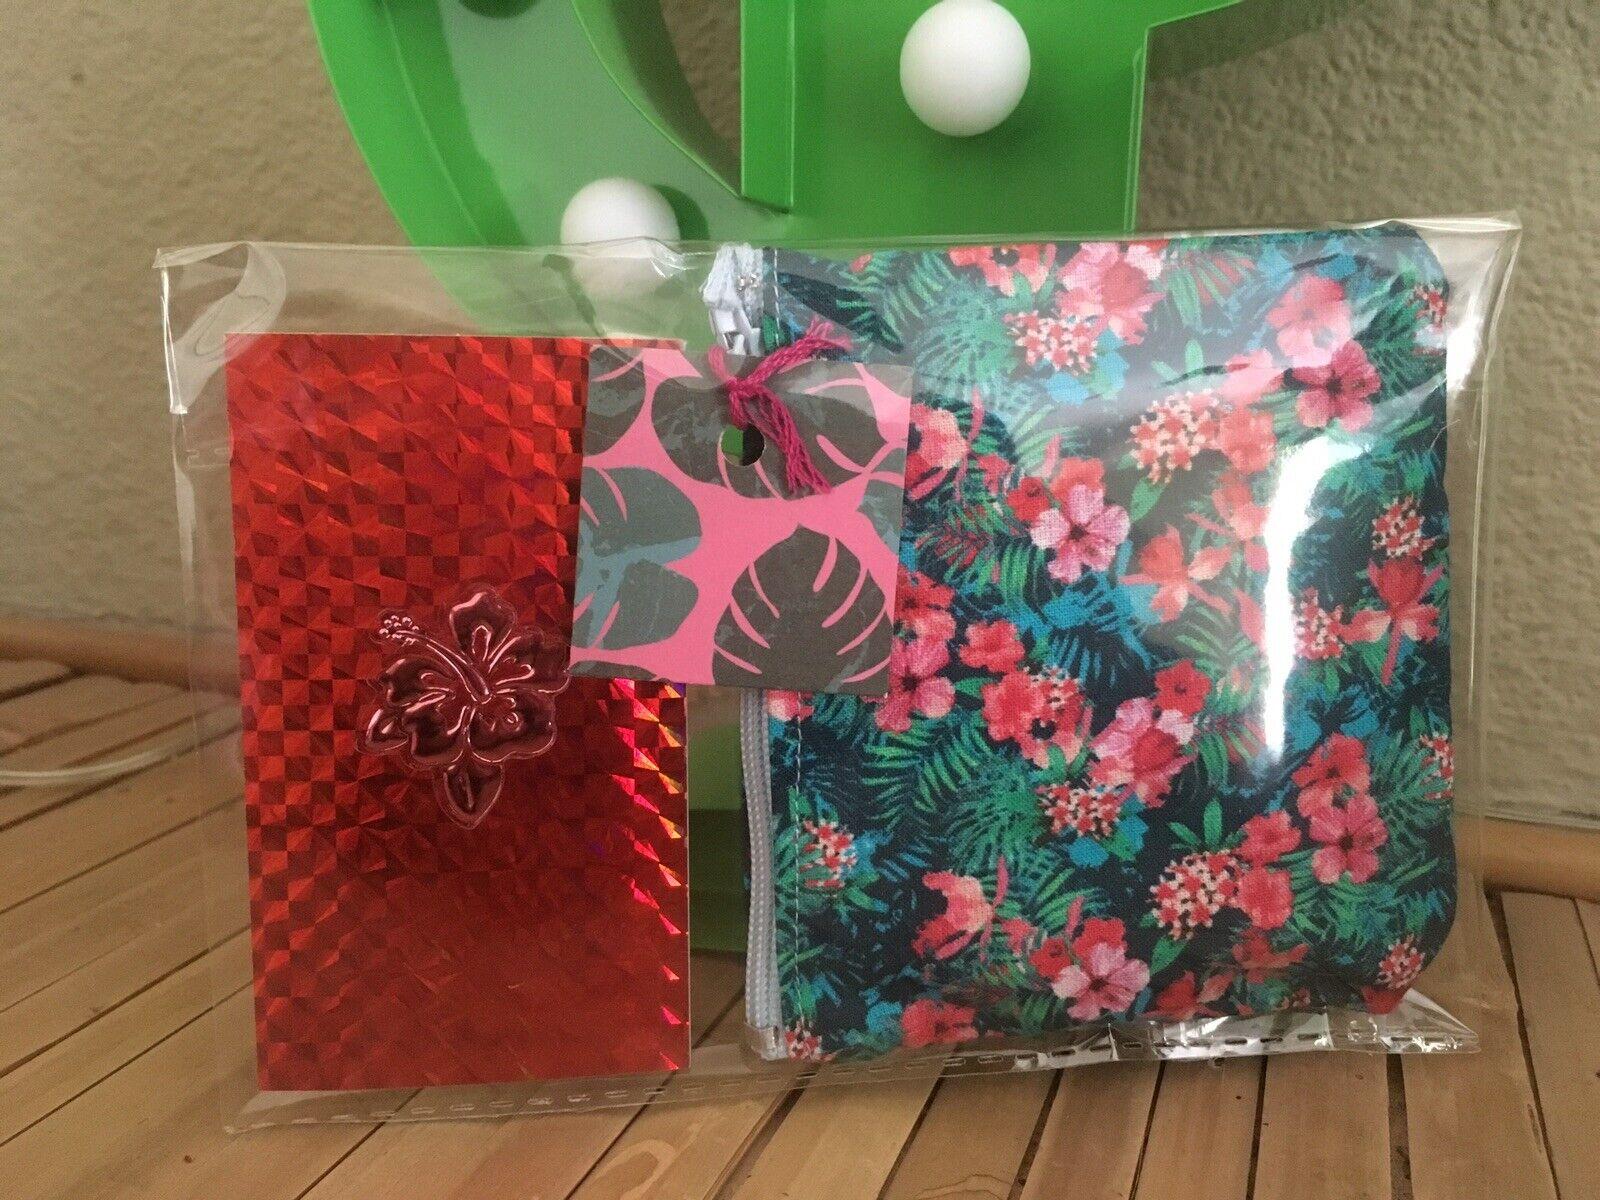 Tropical Floral 🌺 Hibiscus Hawaii Purse & Mini Notebook Jotter 2 Piece Gift Set